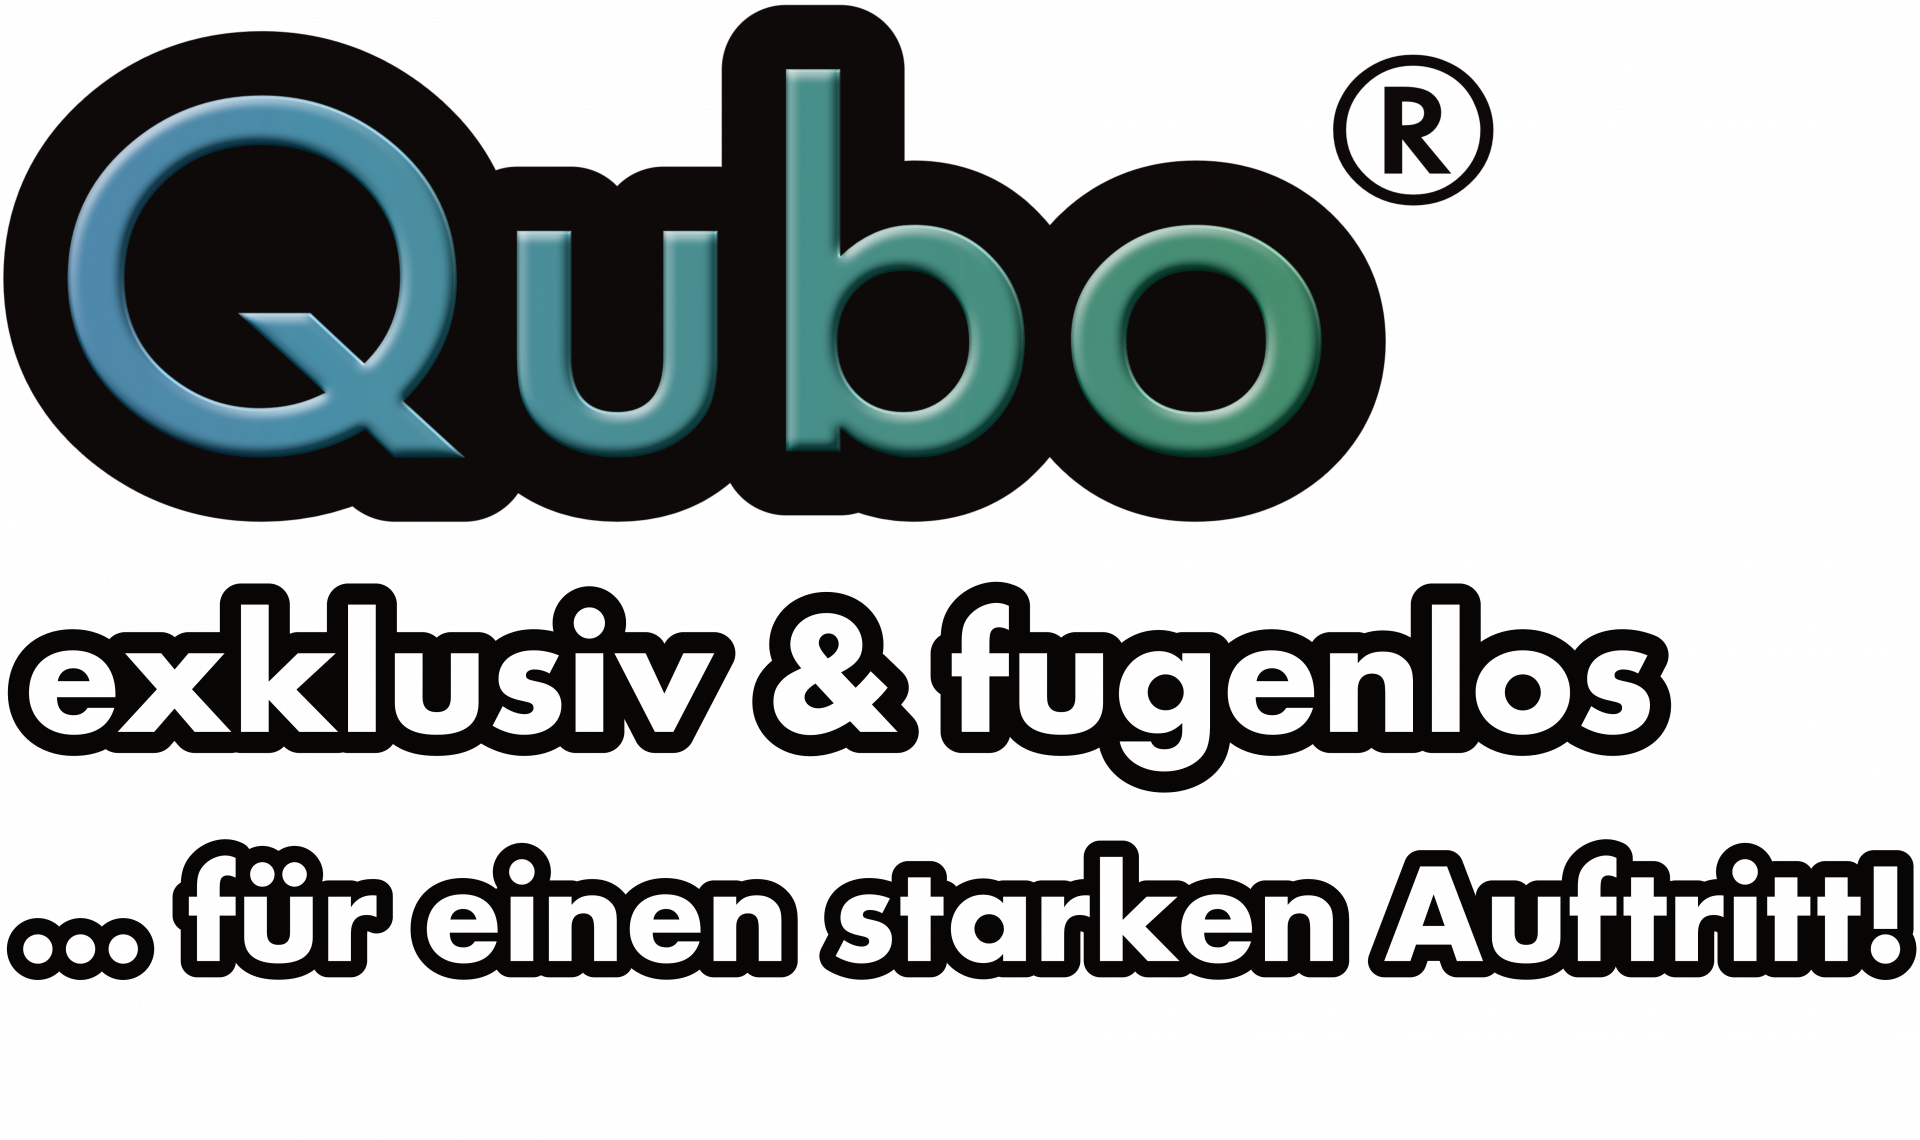 Qubo - exklusiv & fugenlos